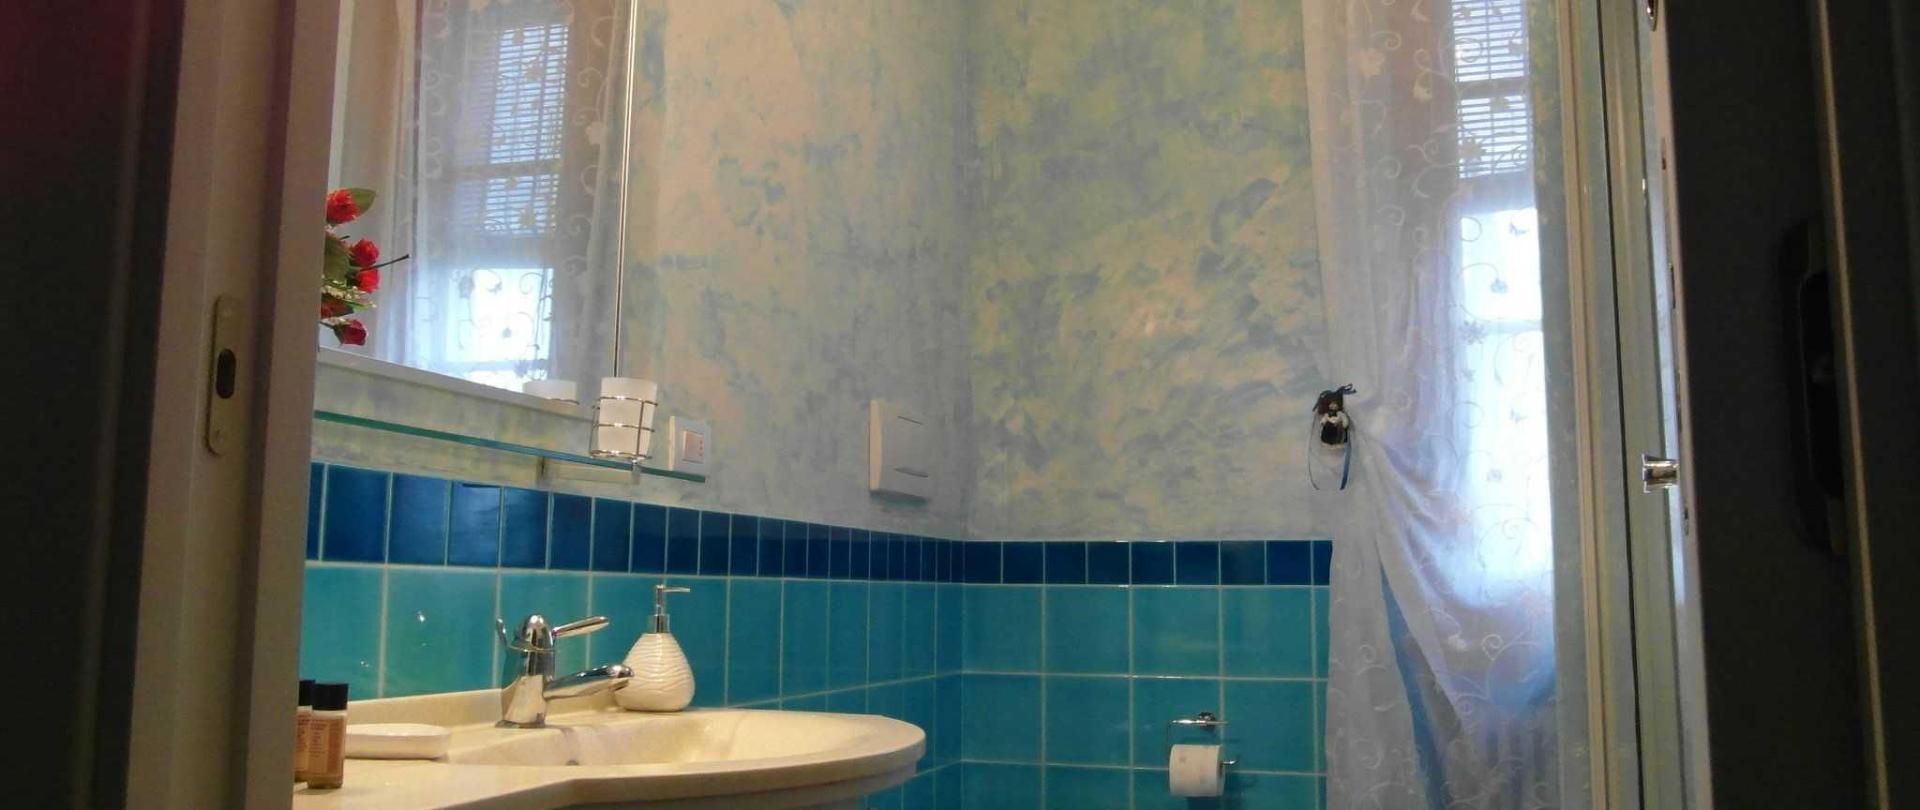 bagno suite 2 camere.JPG